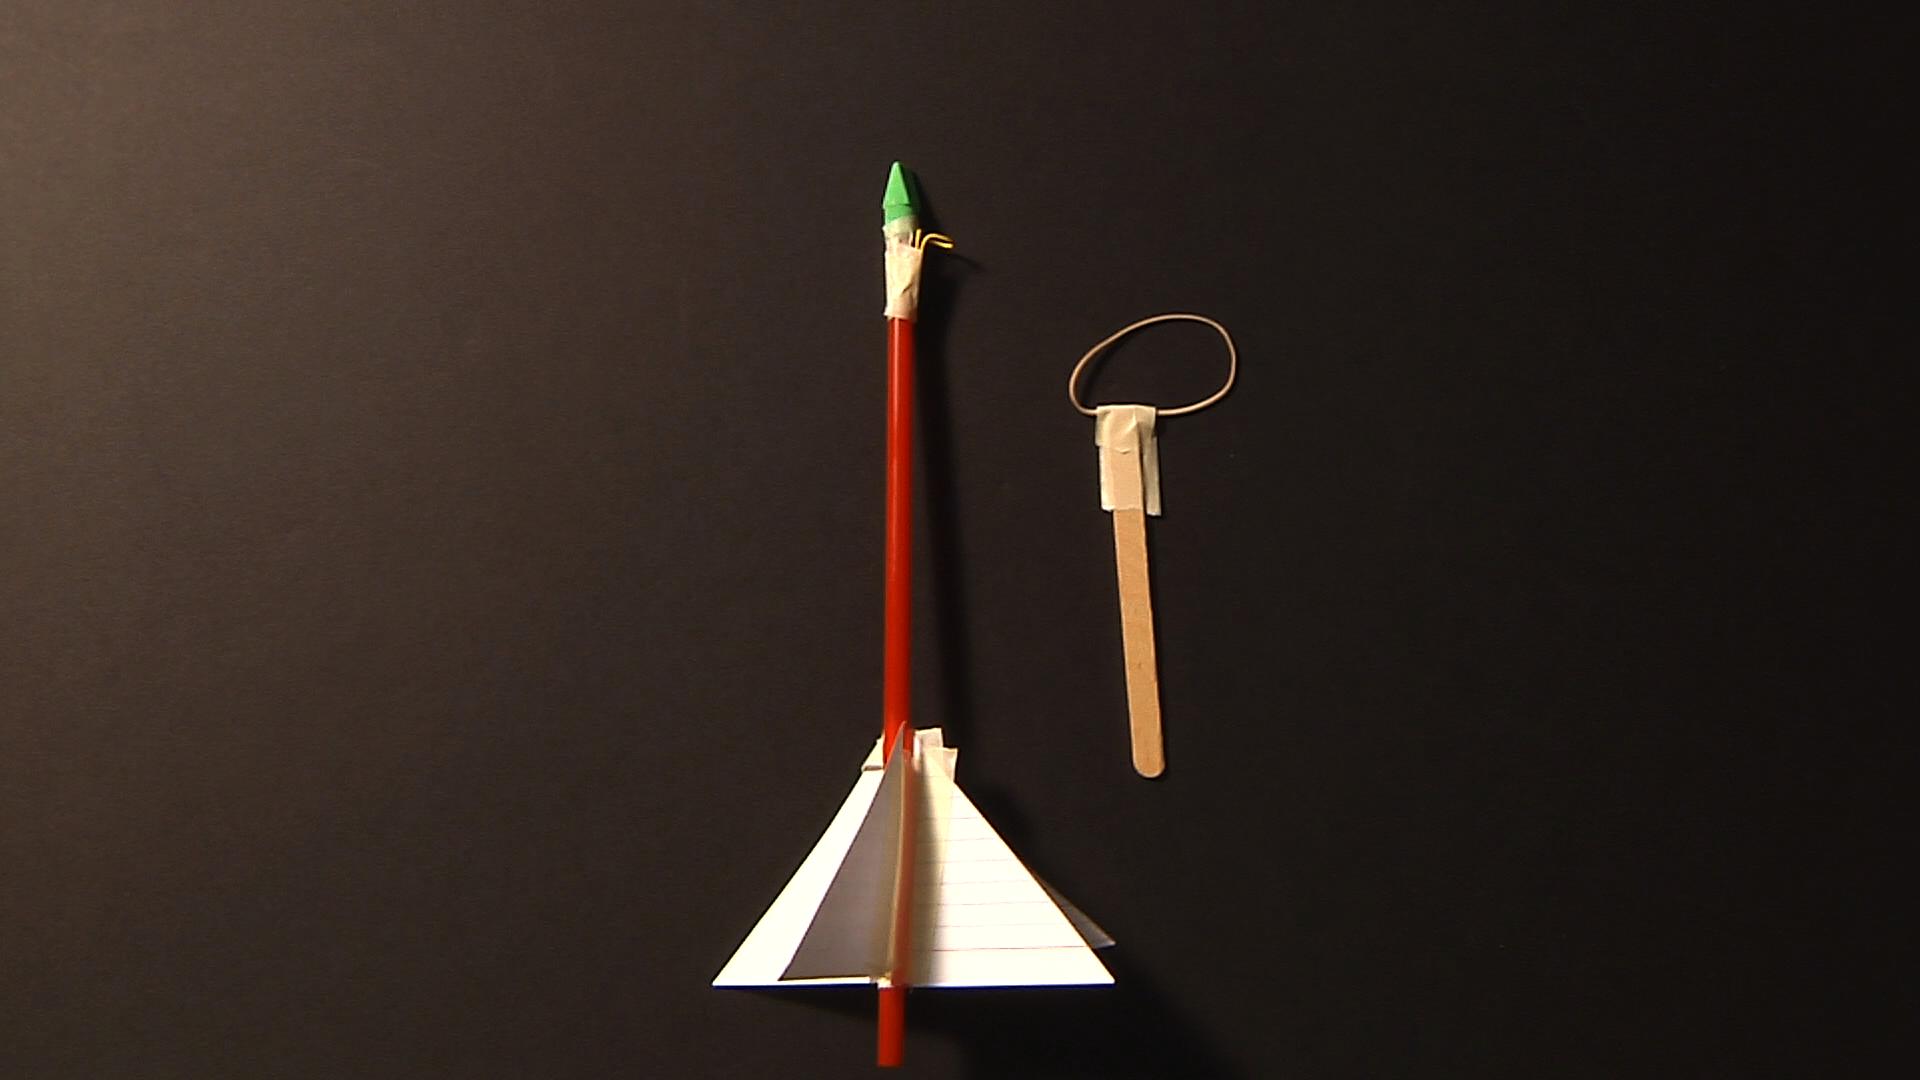 Rubberband Slingshot Rocket